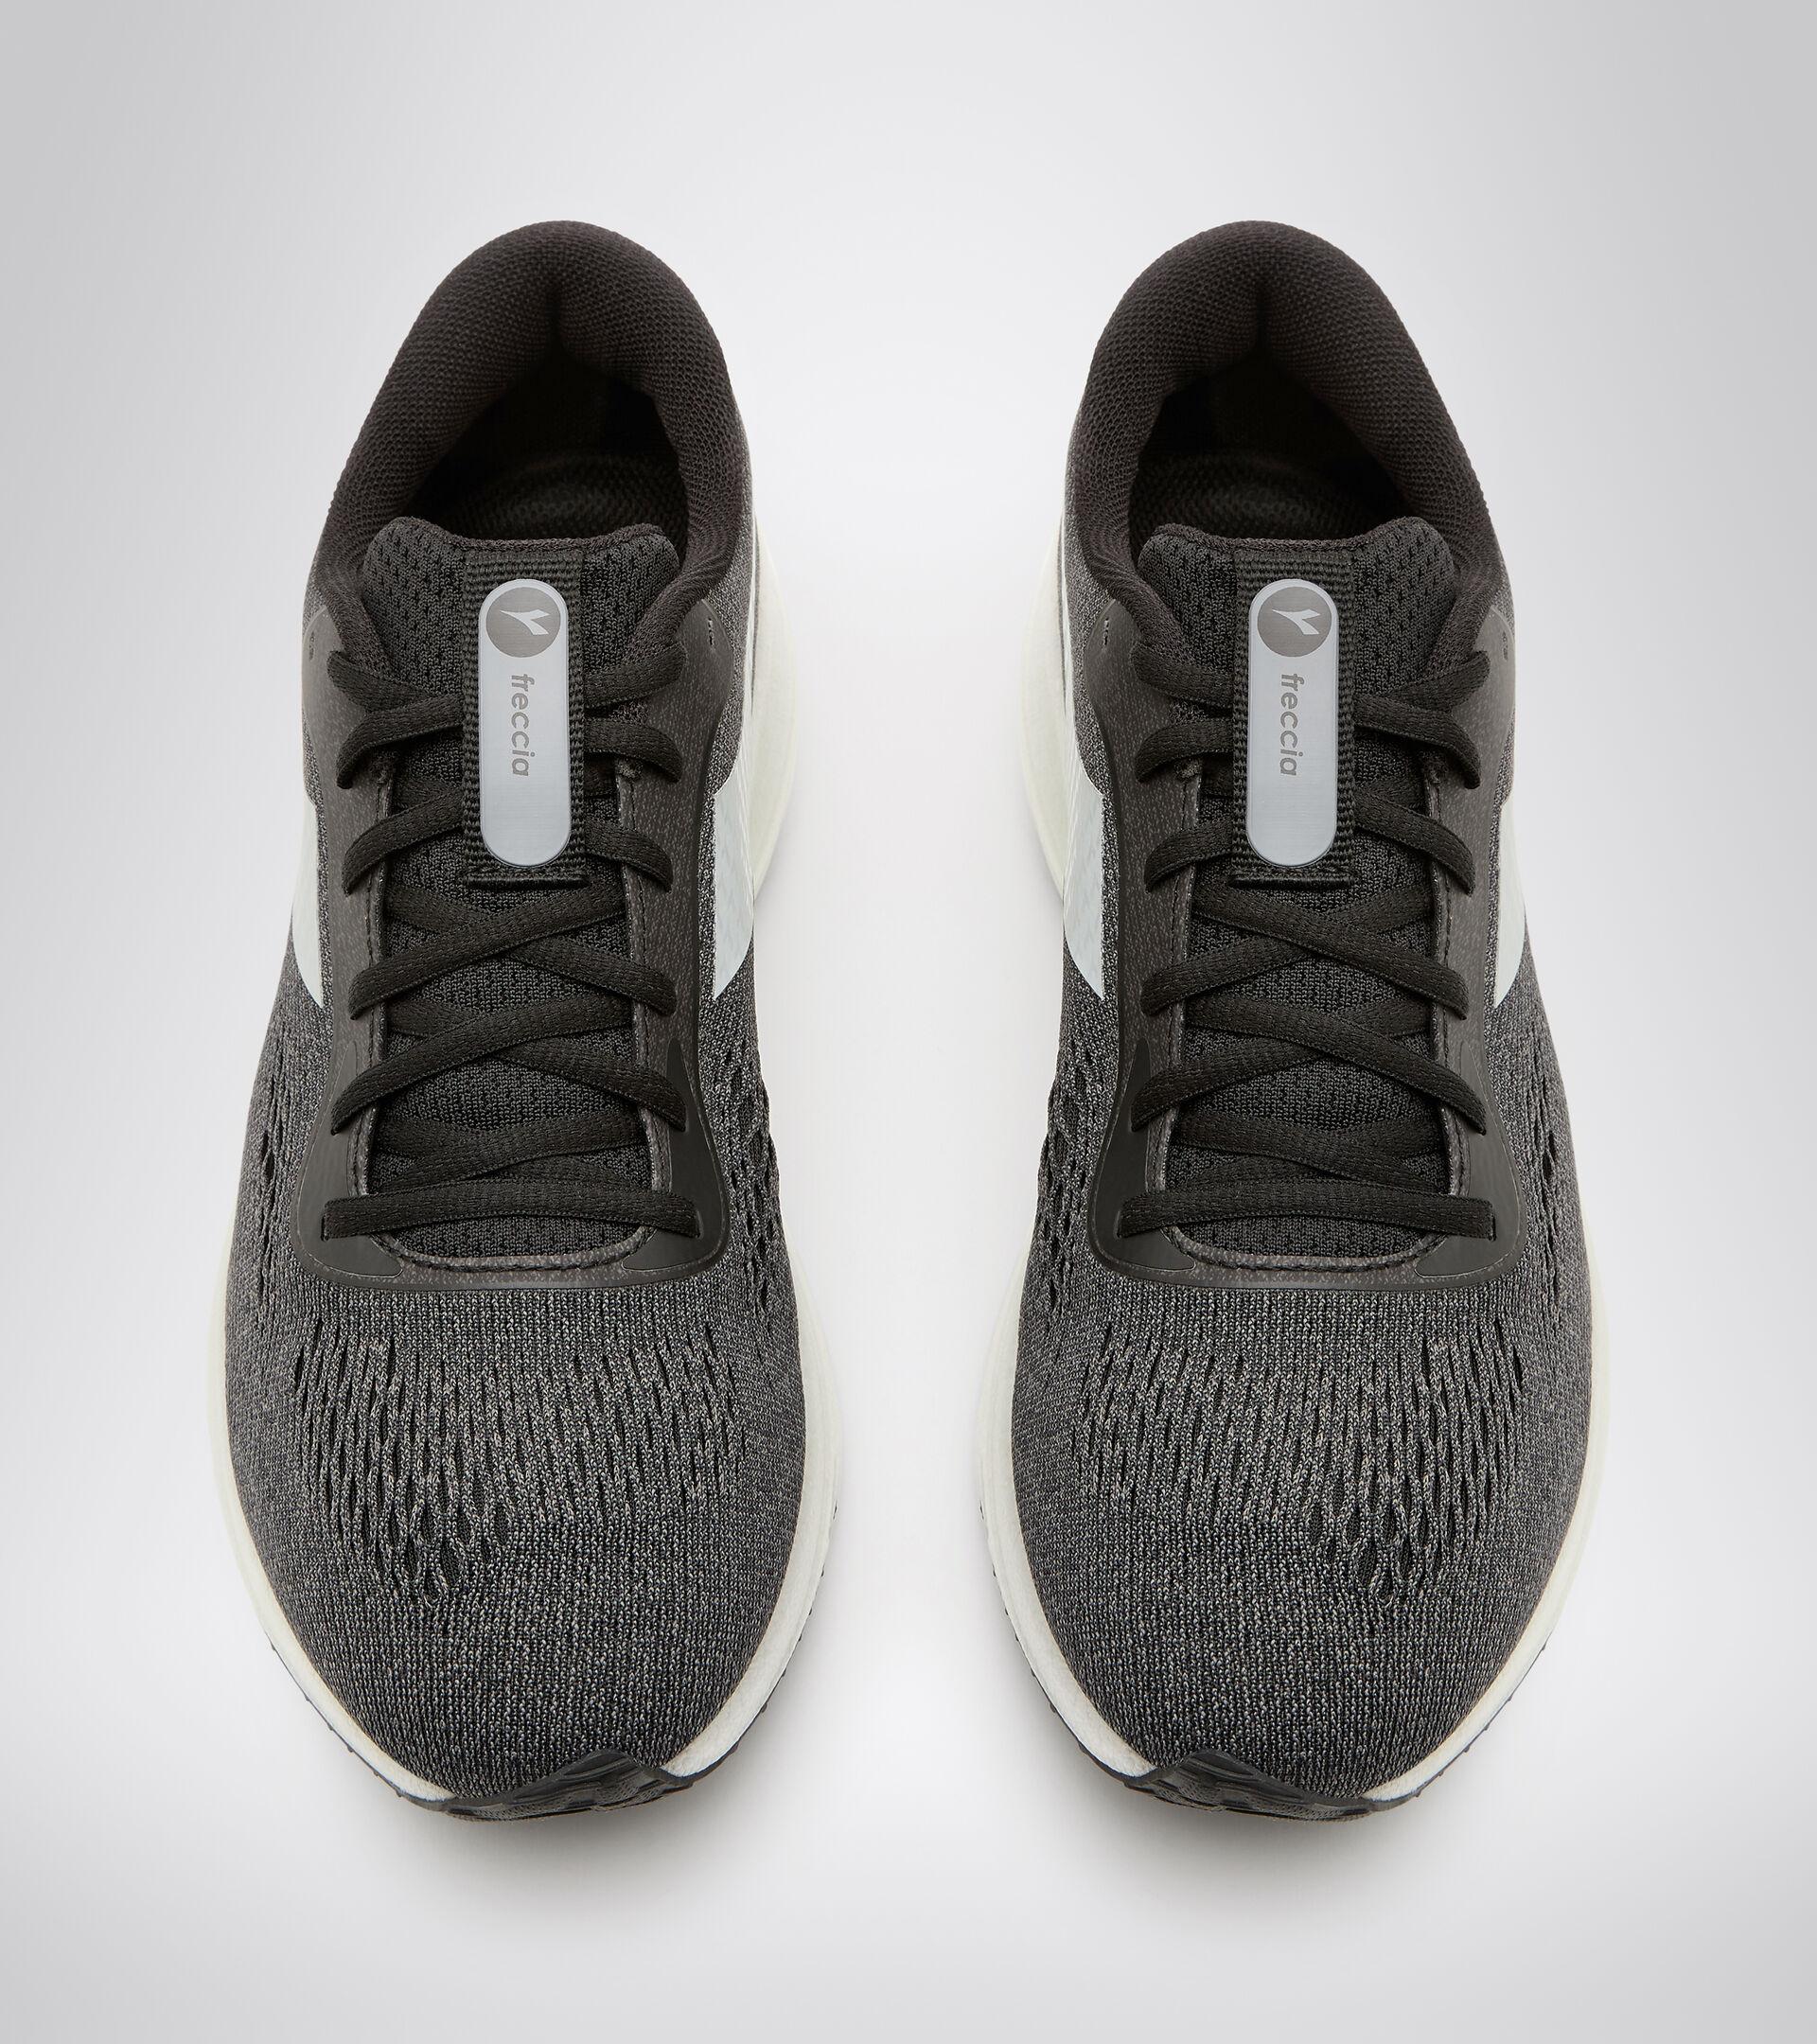 Footwear Sport UOMO FRECCIA BLACK/STEEL GRAY/WHITE Diadora